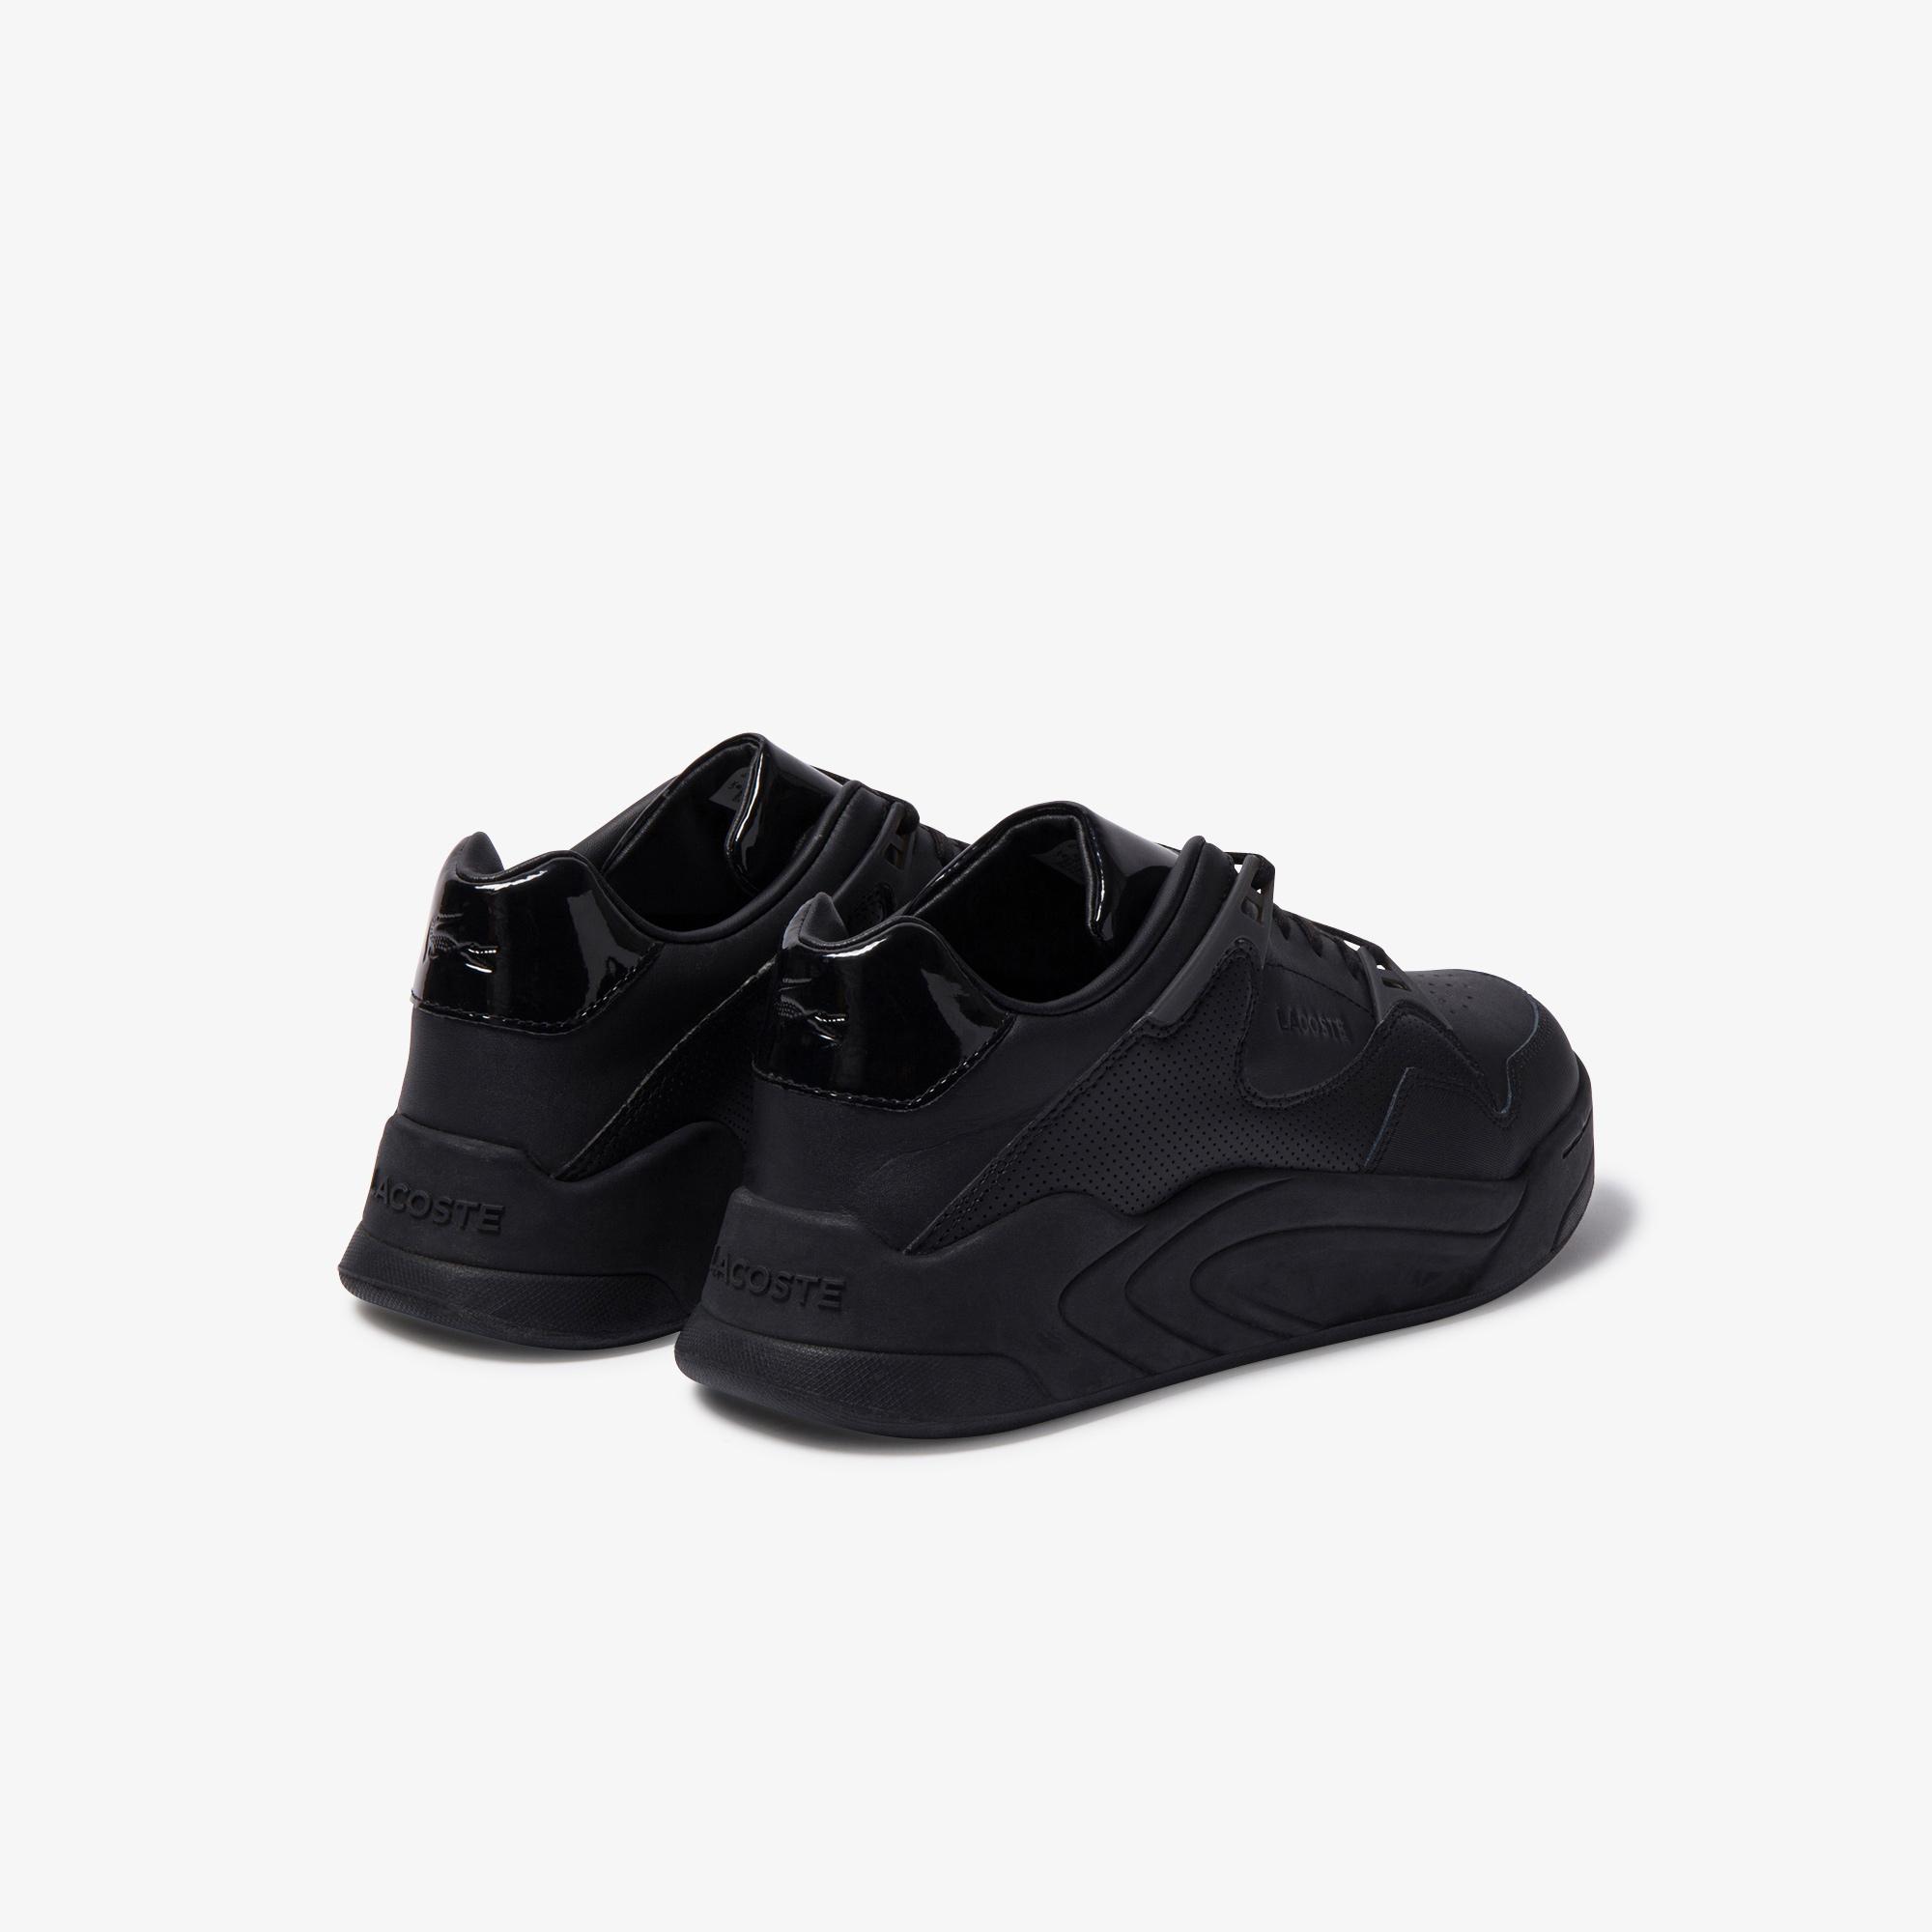 Lacoste Court Slam 120 4 Men's Sneakers